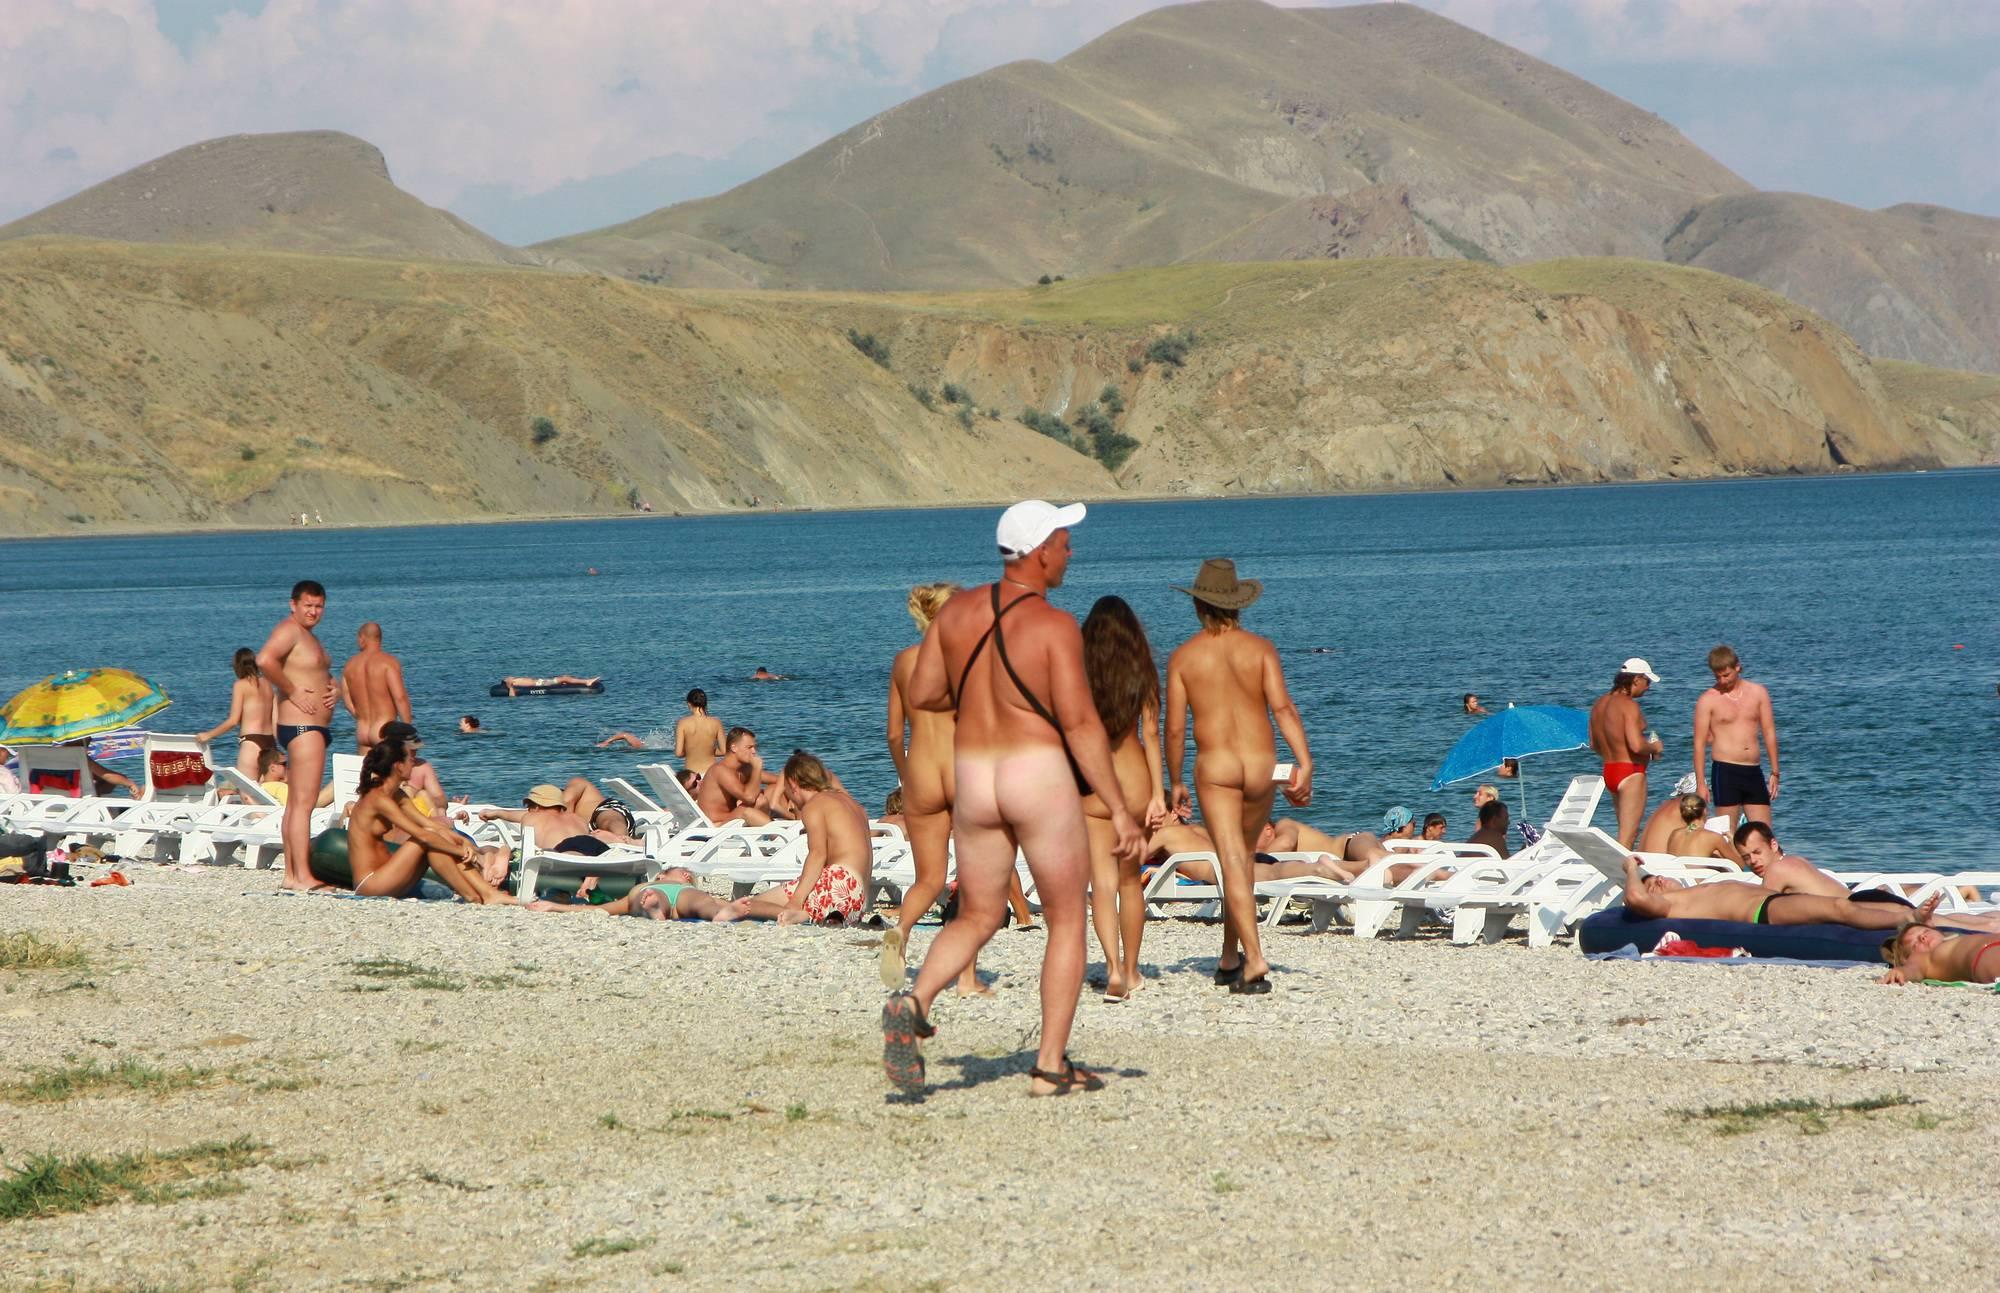 Nudist Photos Ukraine Beach Collection - 2